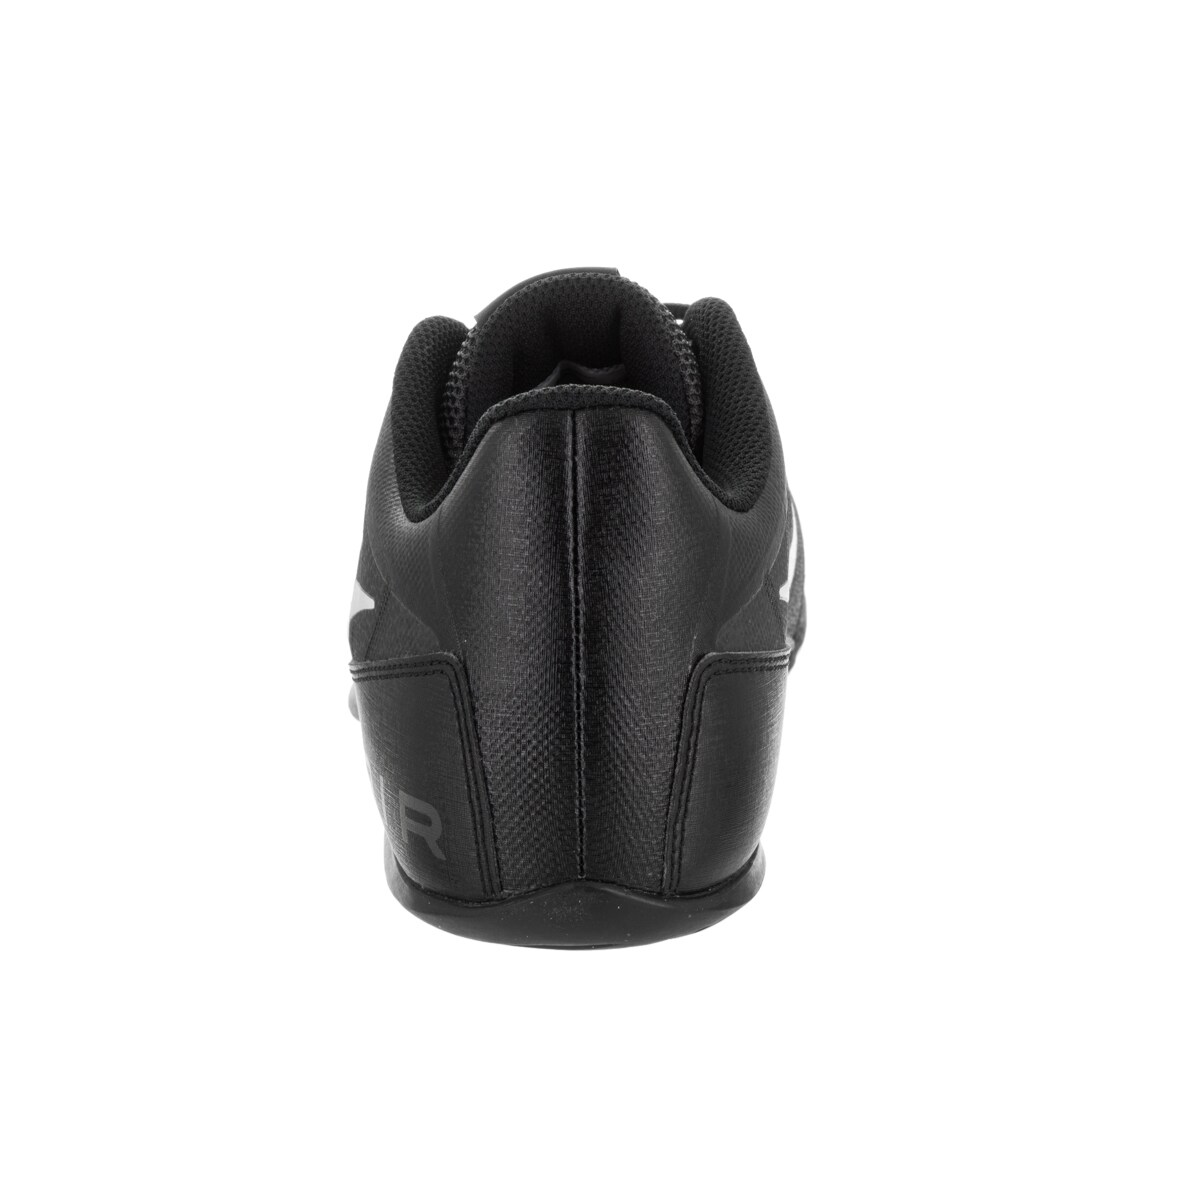 the best attitude 6ecca c8c3d Shop Nike Men s Air Mavin Low 2 Basketball Shoe - Free Shipping Today -  Overstock - 16006382